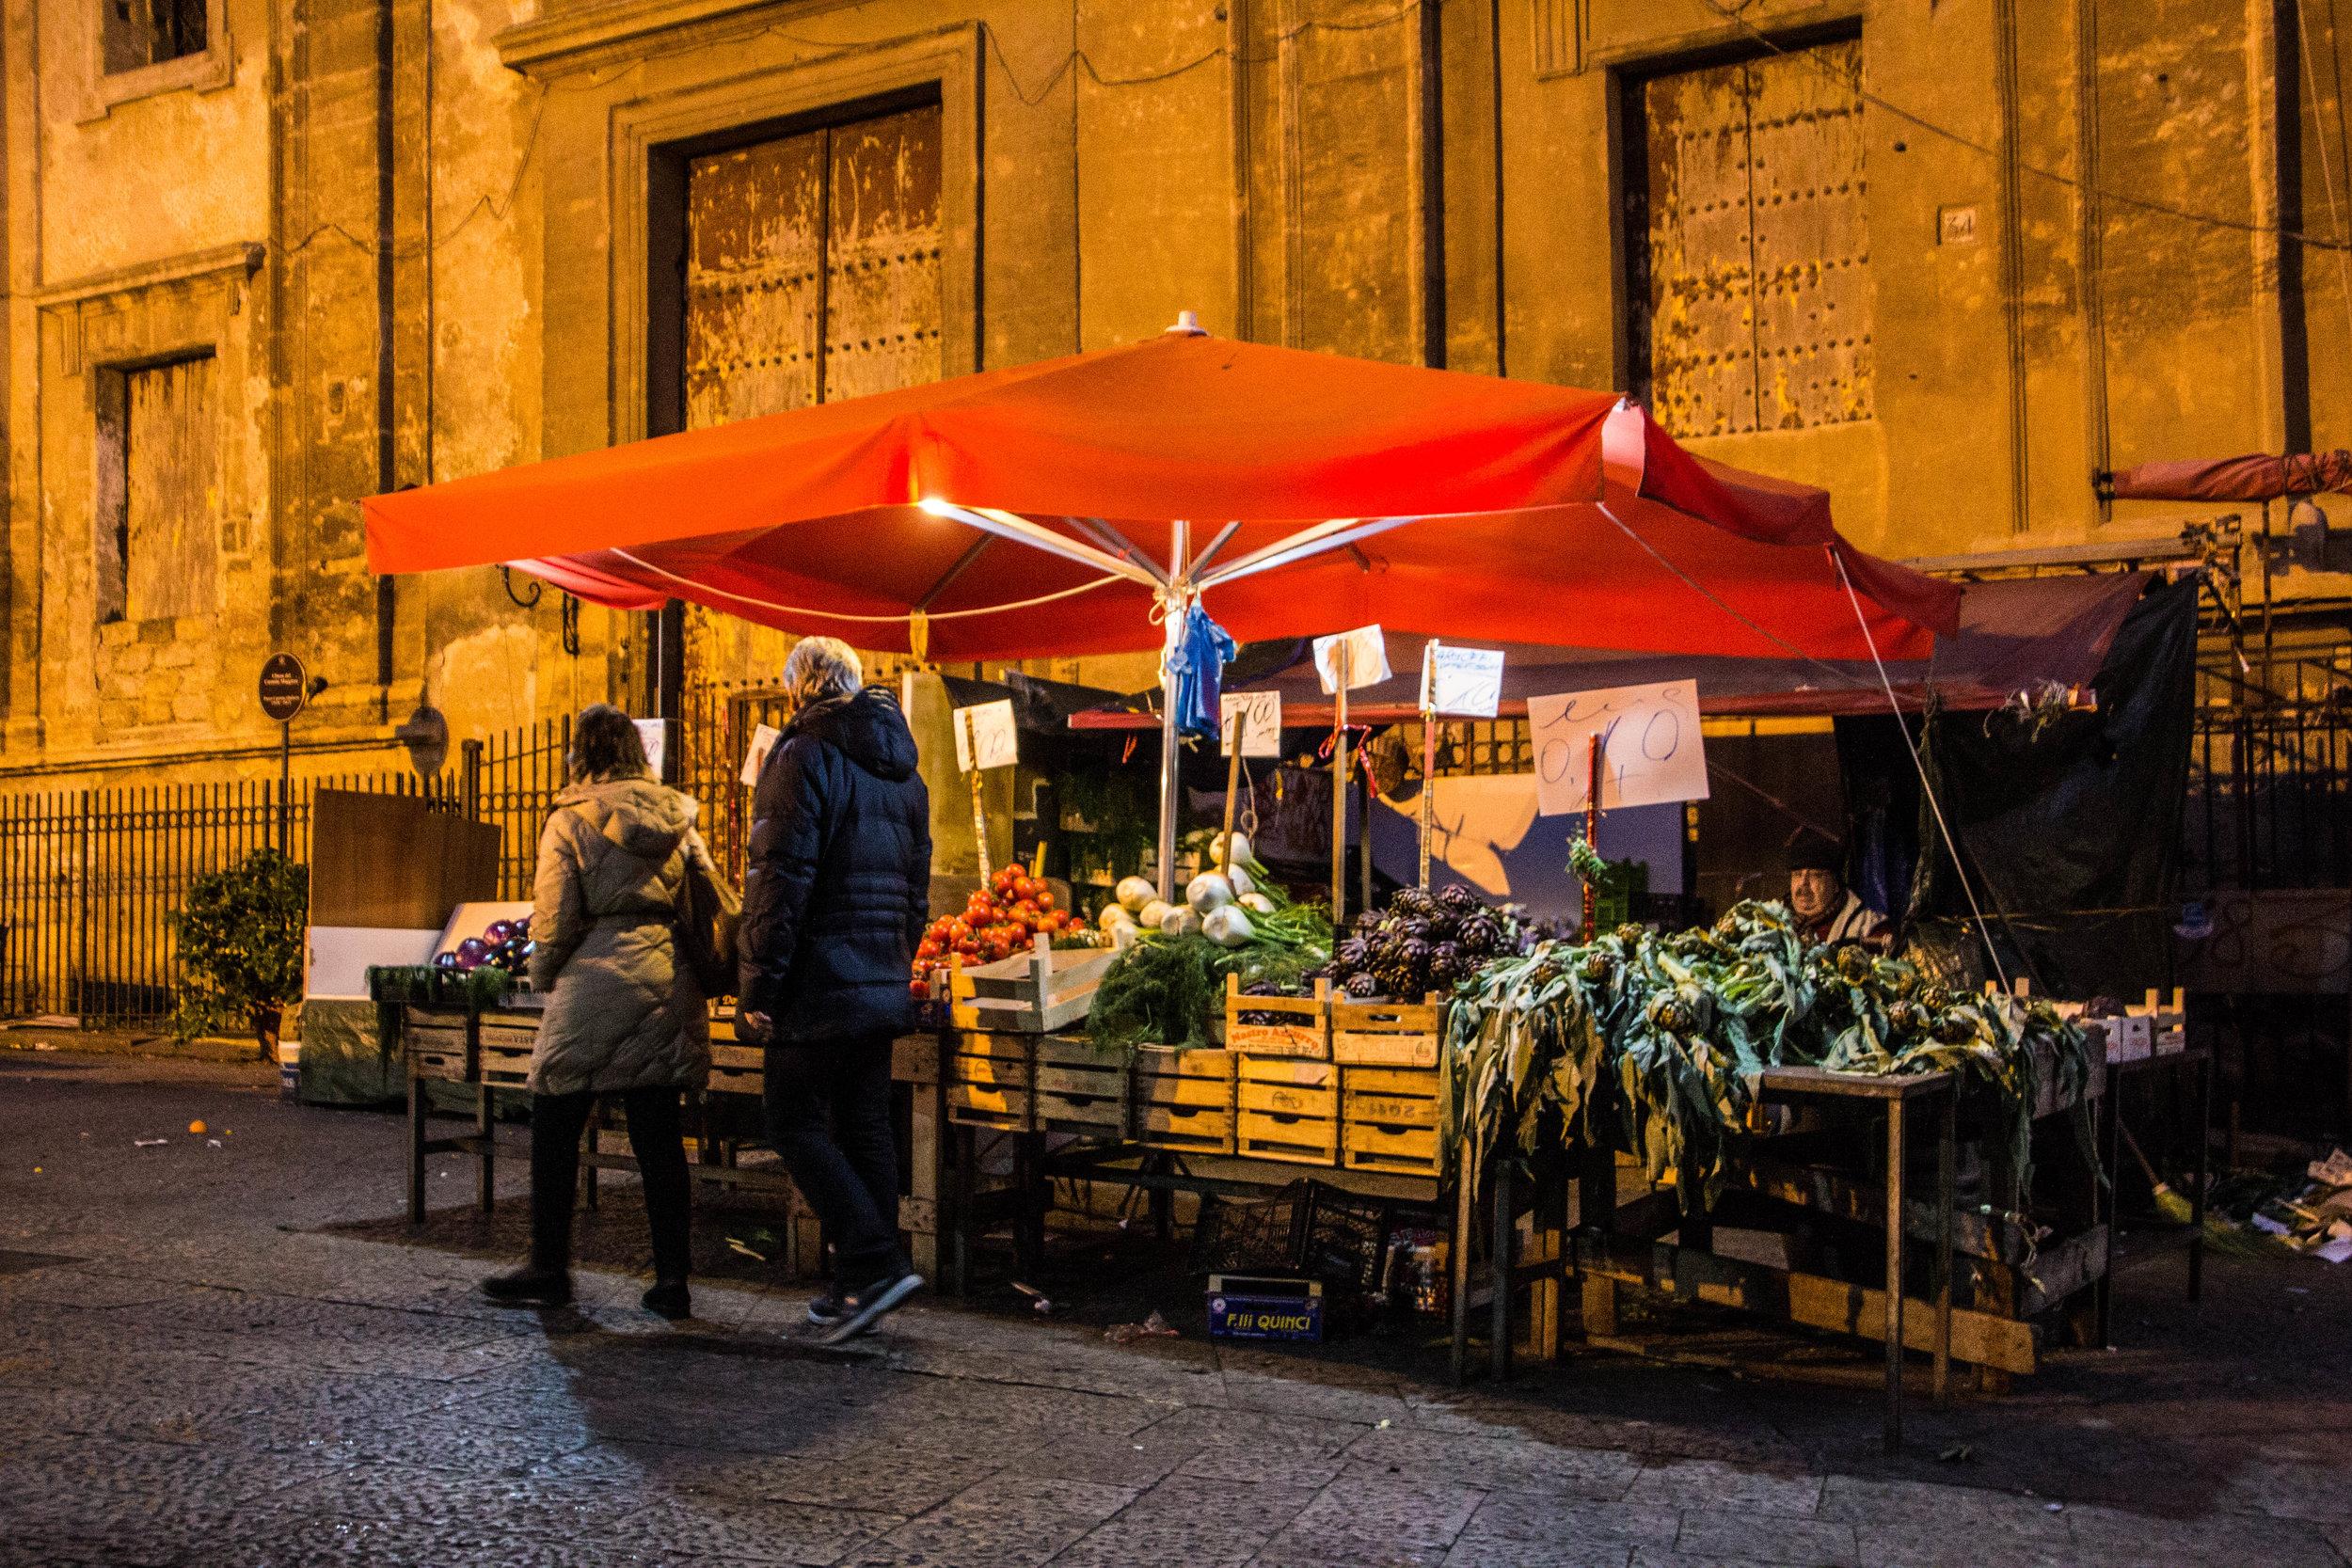 night-street-market-palermo-sicily-1.jpg